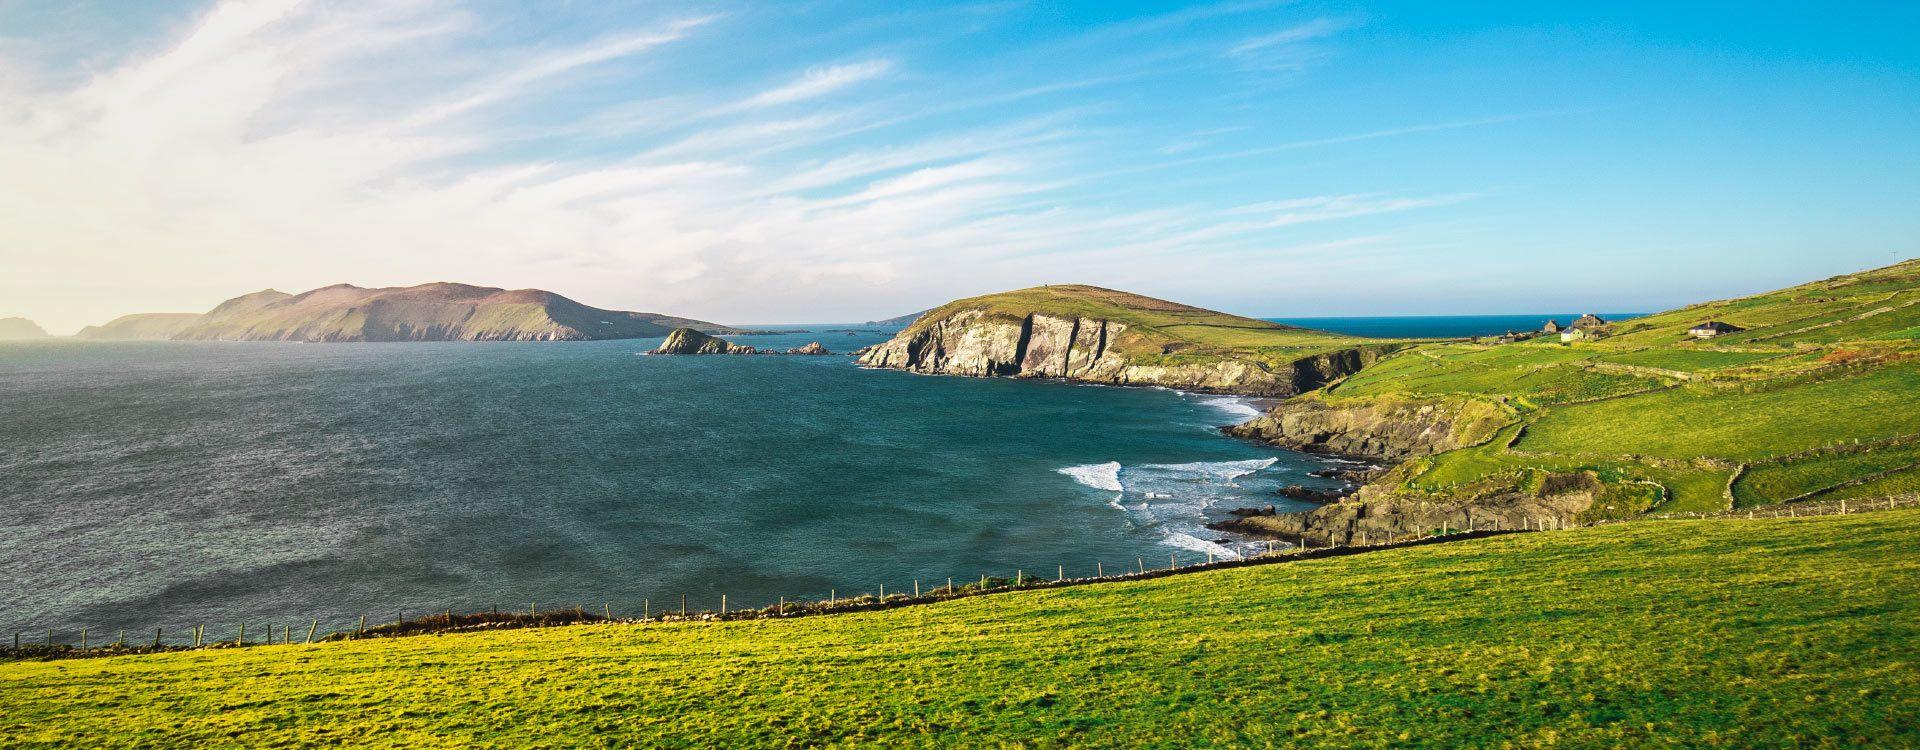 Península de Dingle: excursión de un día desde Cork